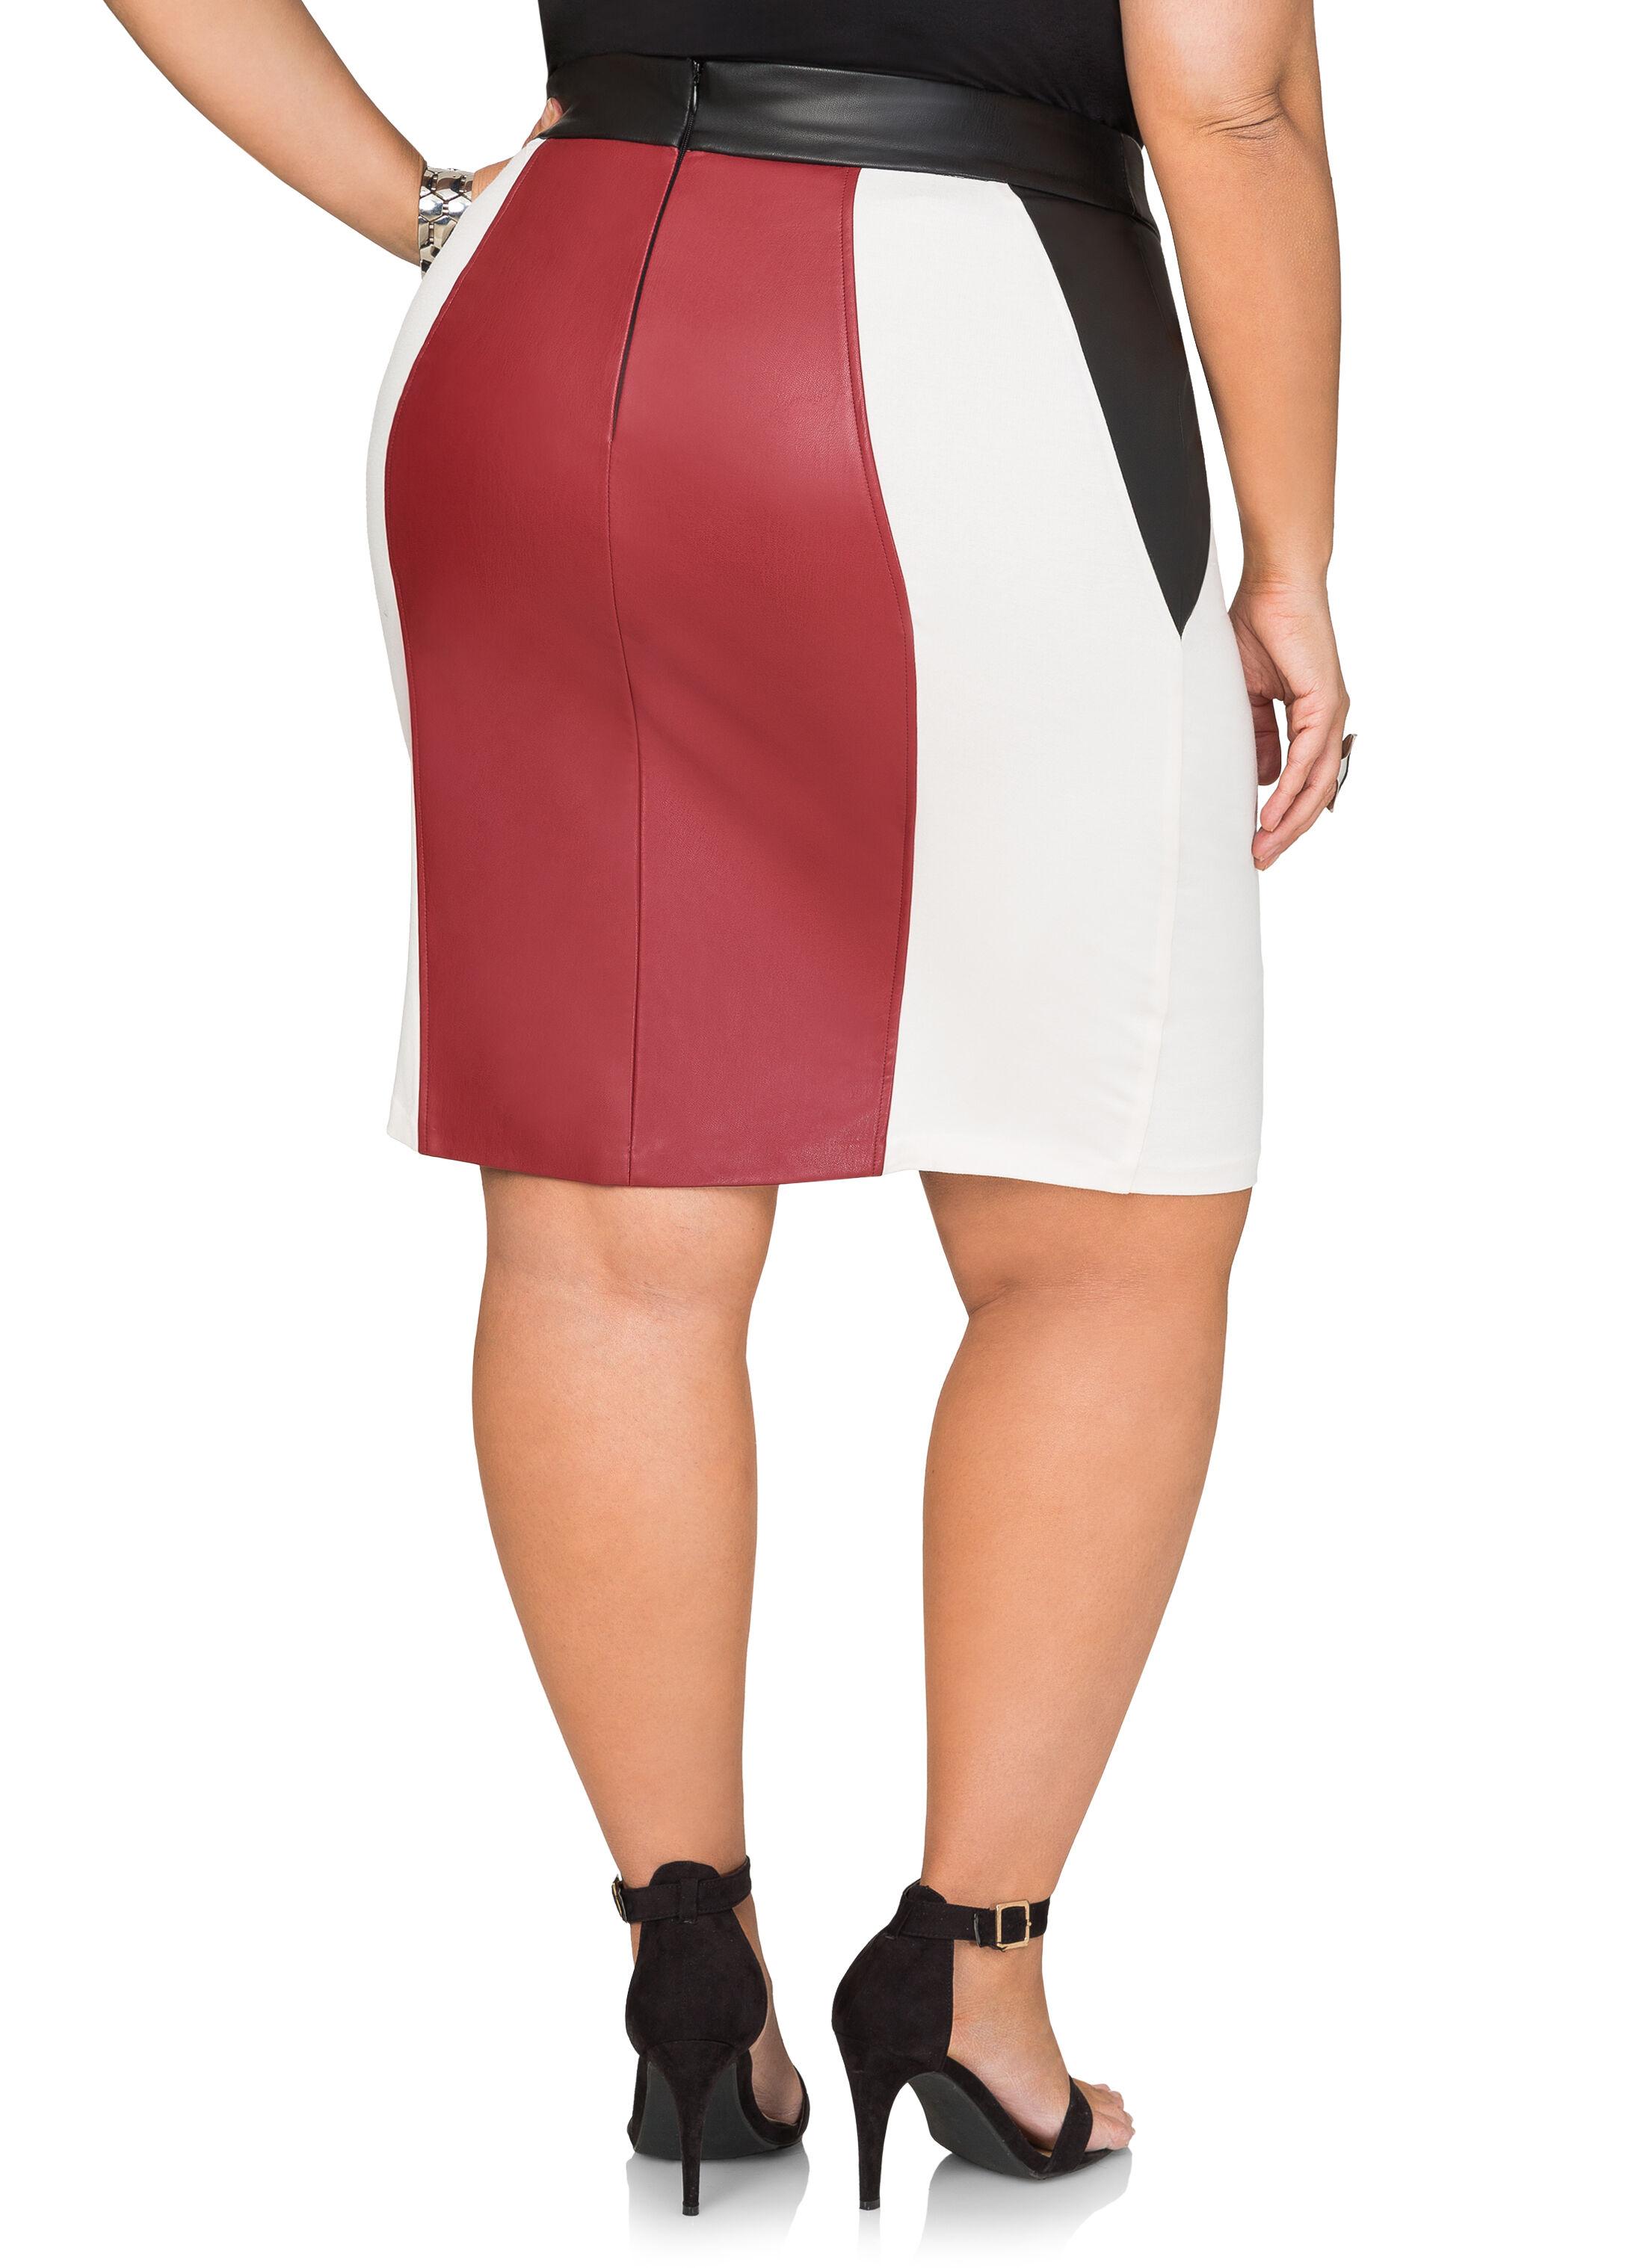 Ponti Faux Leather Pencil Skirt